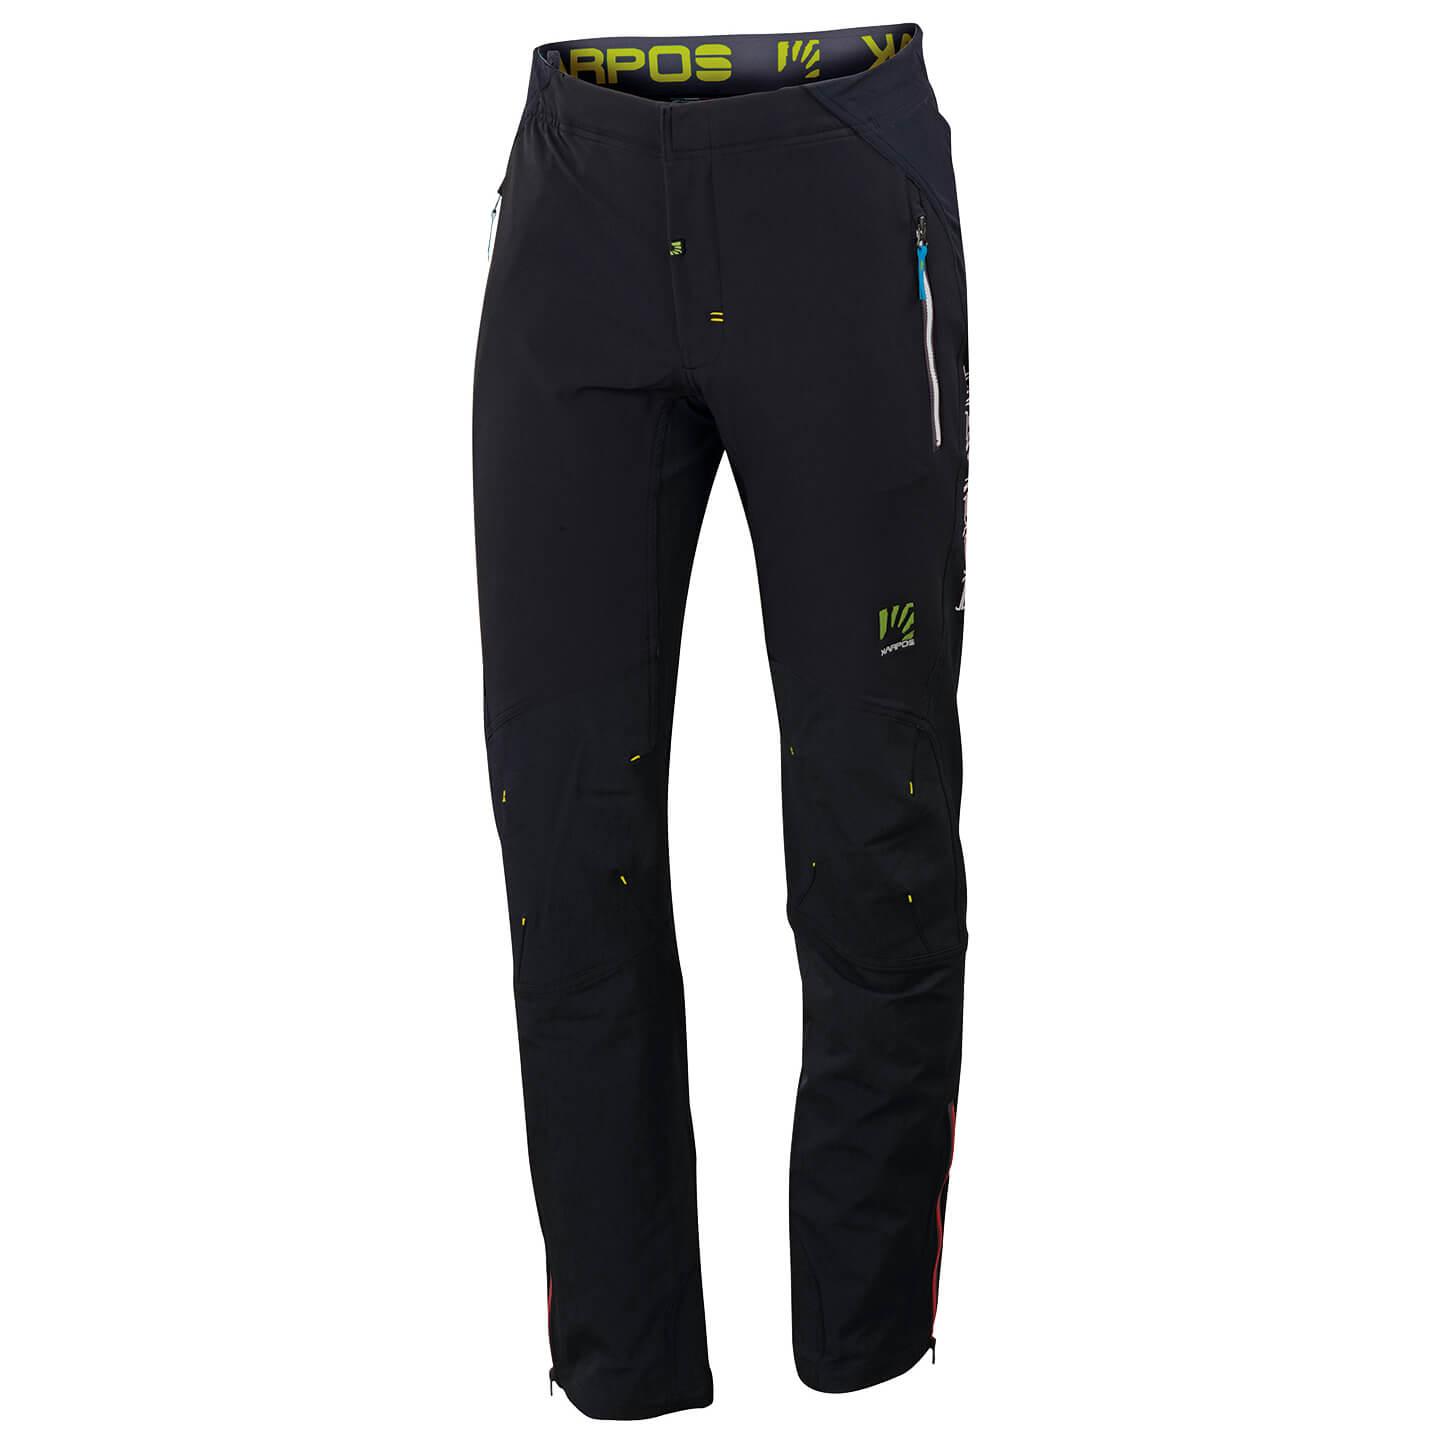 Black Wall Grey50eu Randonnée Evo De Karpos Pantalon Dark Pant PwknO0